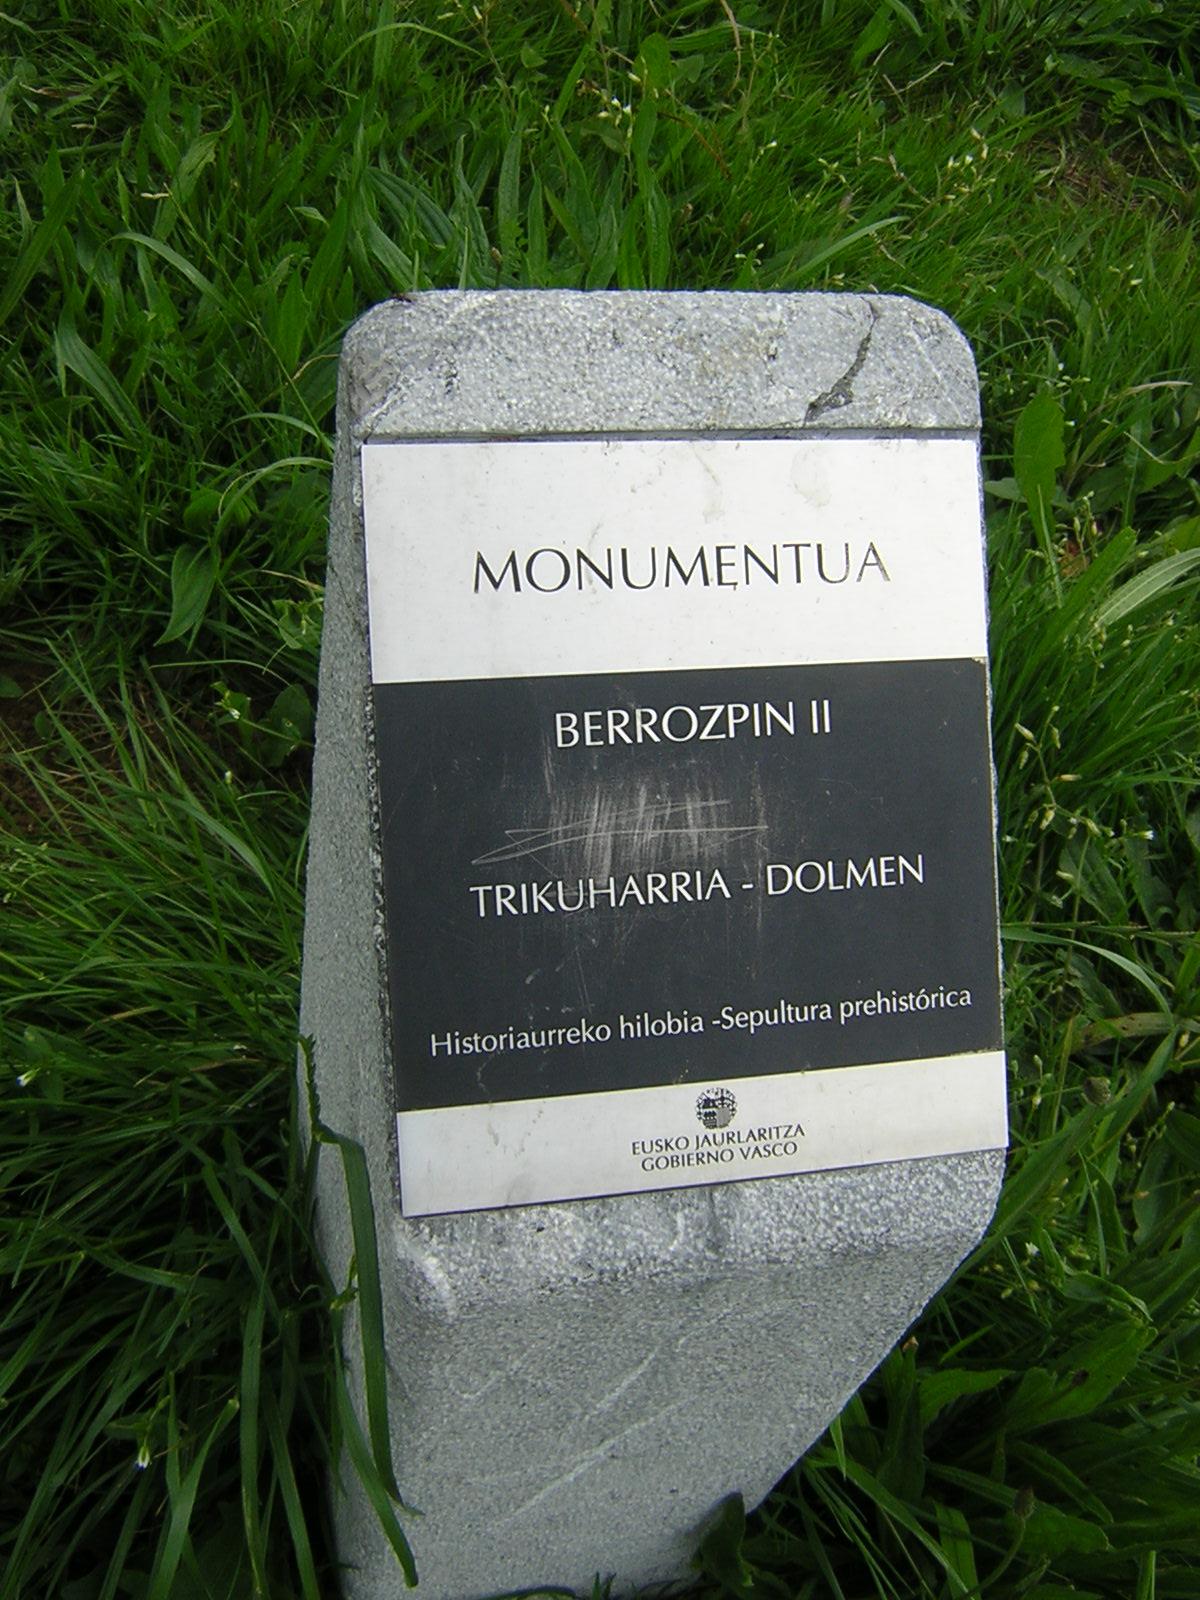 Dolmen Berrozpin 2 Trikuharria